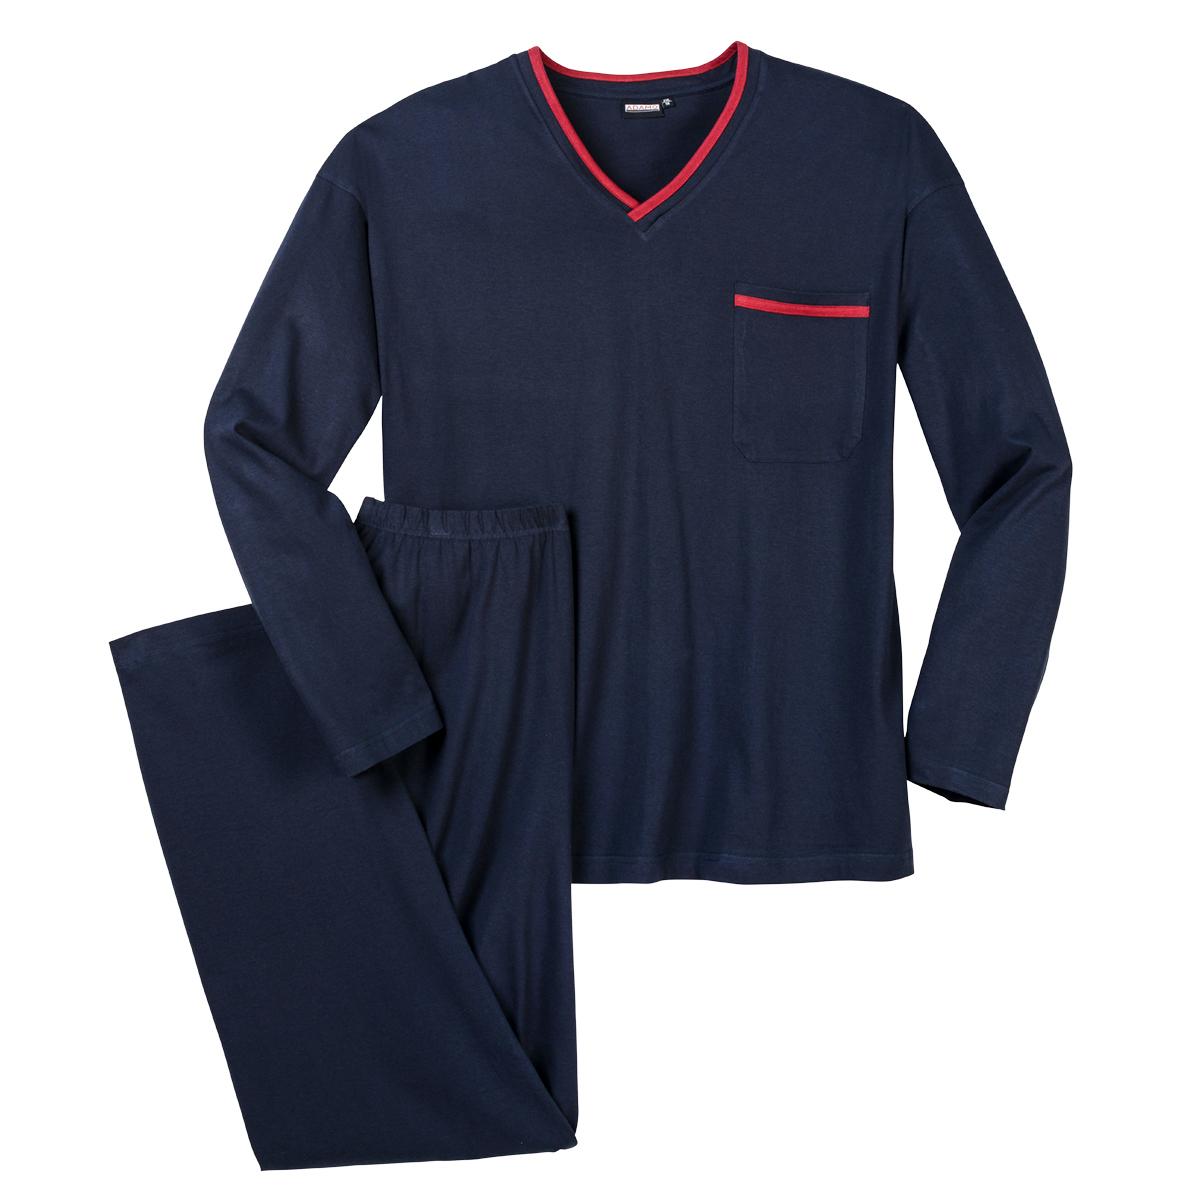 Adamo Übergrößen Pyjama dunkelblau 2XL 3XL 4XL 5XL 6XL 7XL 8XL 9XL 10XL NEU